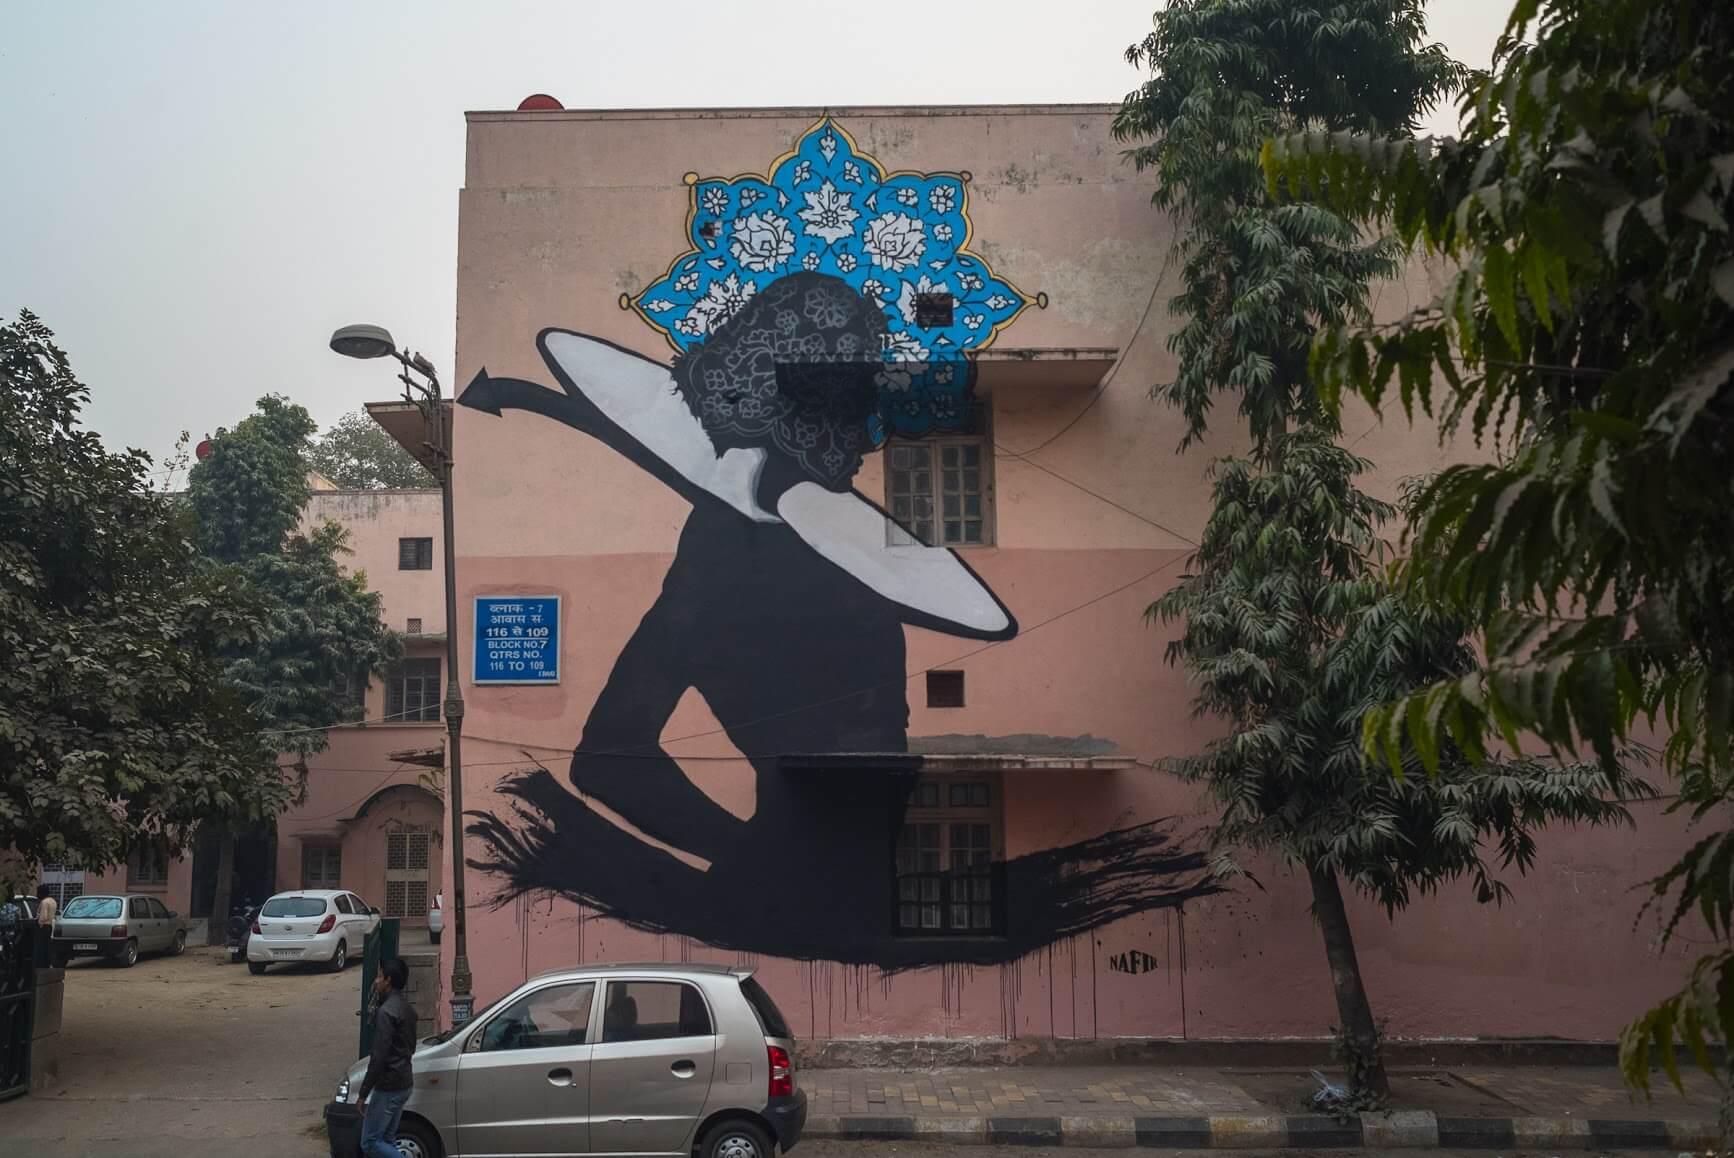 St+art Delhi Street Art Festival 2016 | GraffitiStreet com/News